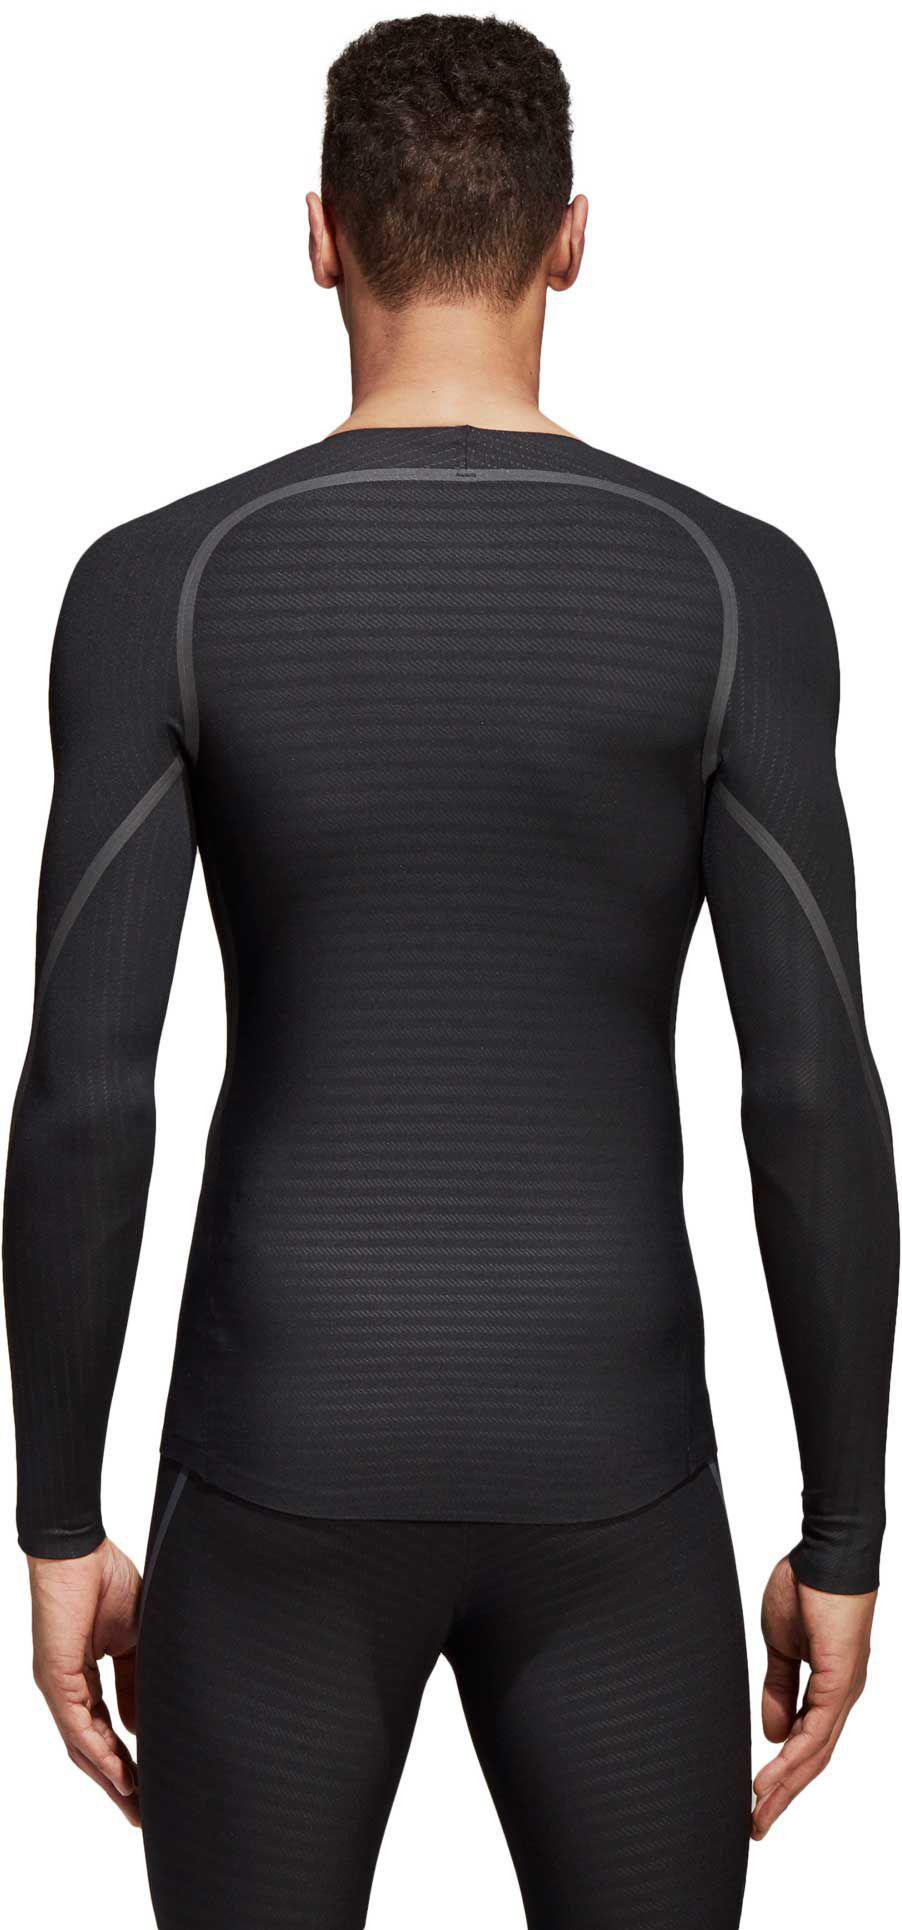 ef1cbb311386d Adidas - Black Alphaskin 360 Long Sleeve Shirt for Men - Lyst. View  fullscreen